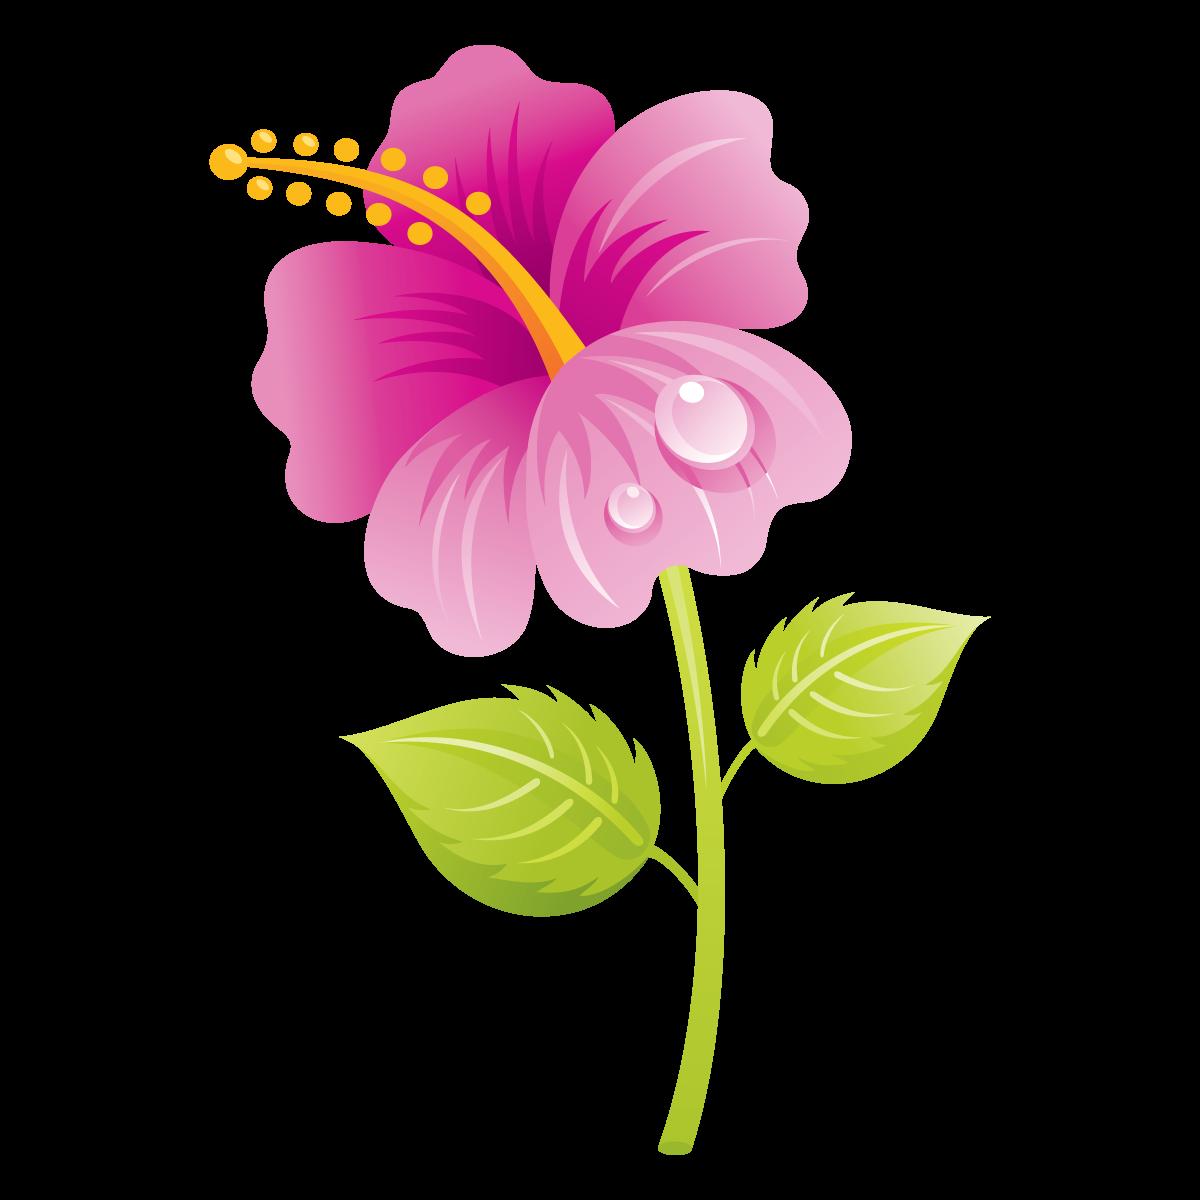 Flower clipart logo. Wordpress mother s day